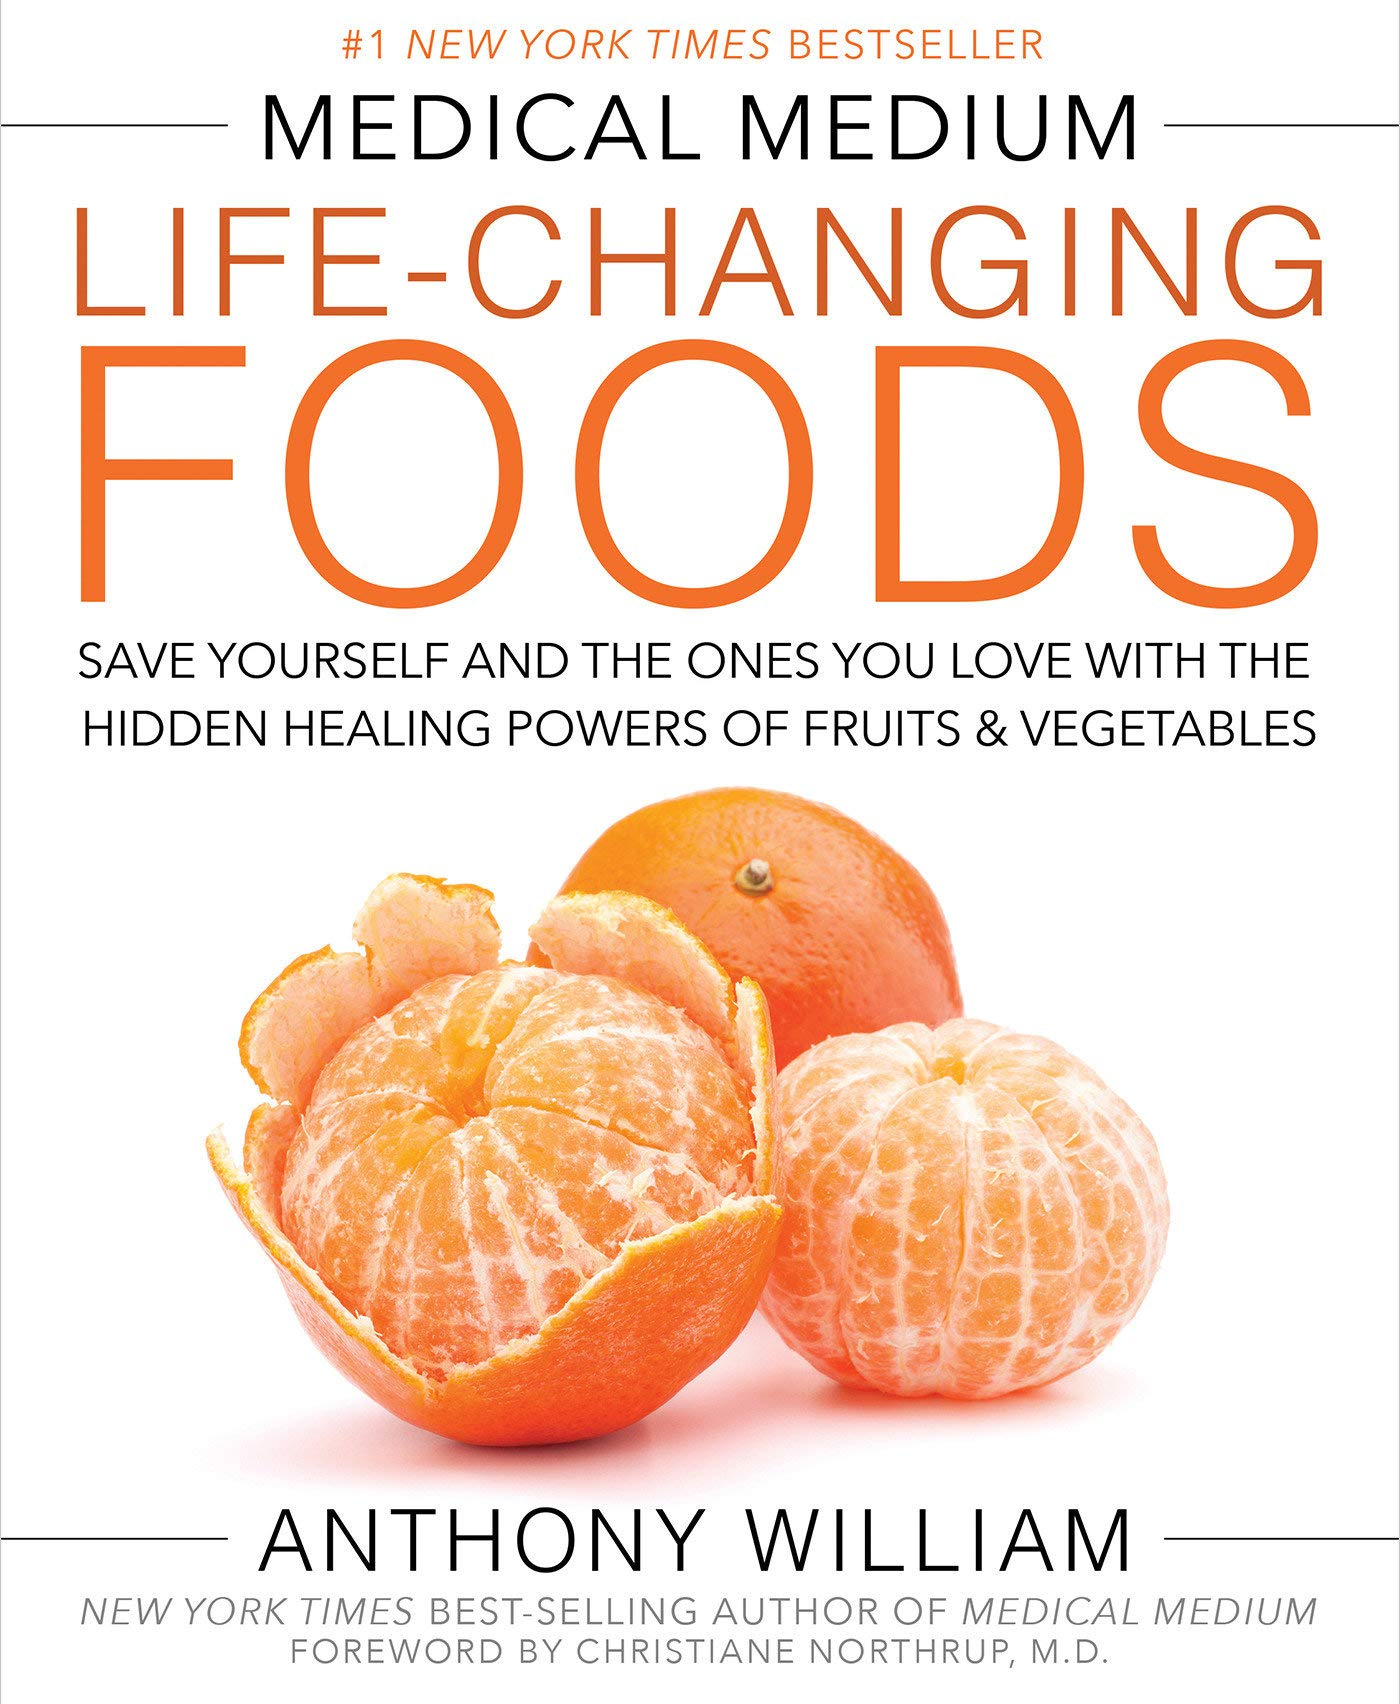 Medical Medium: Life-Changing Foods - Anthony William